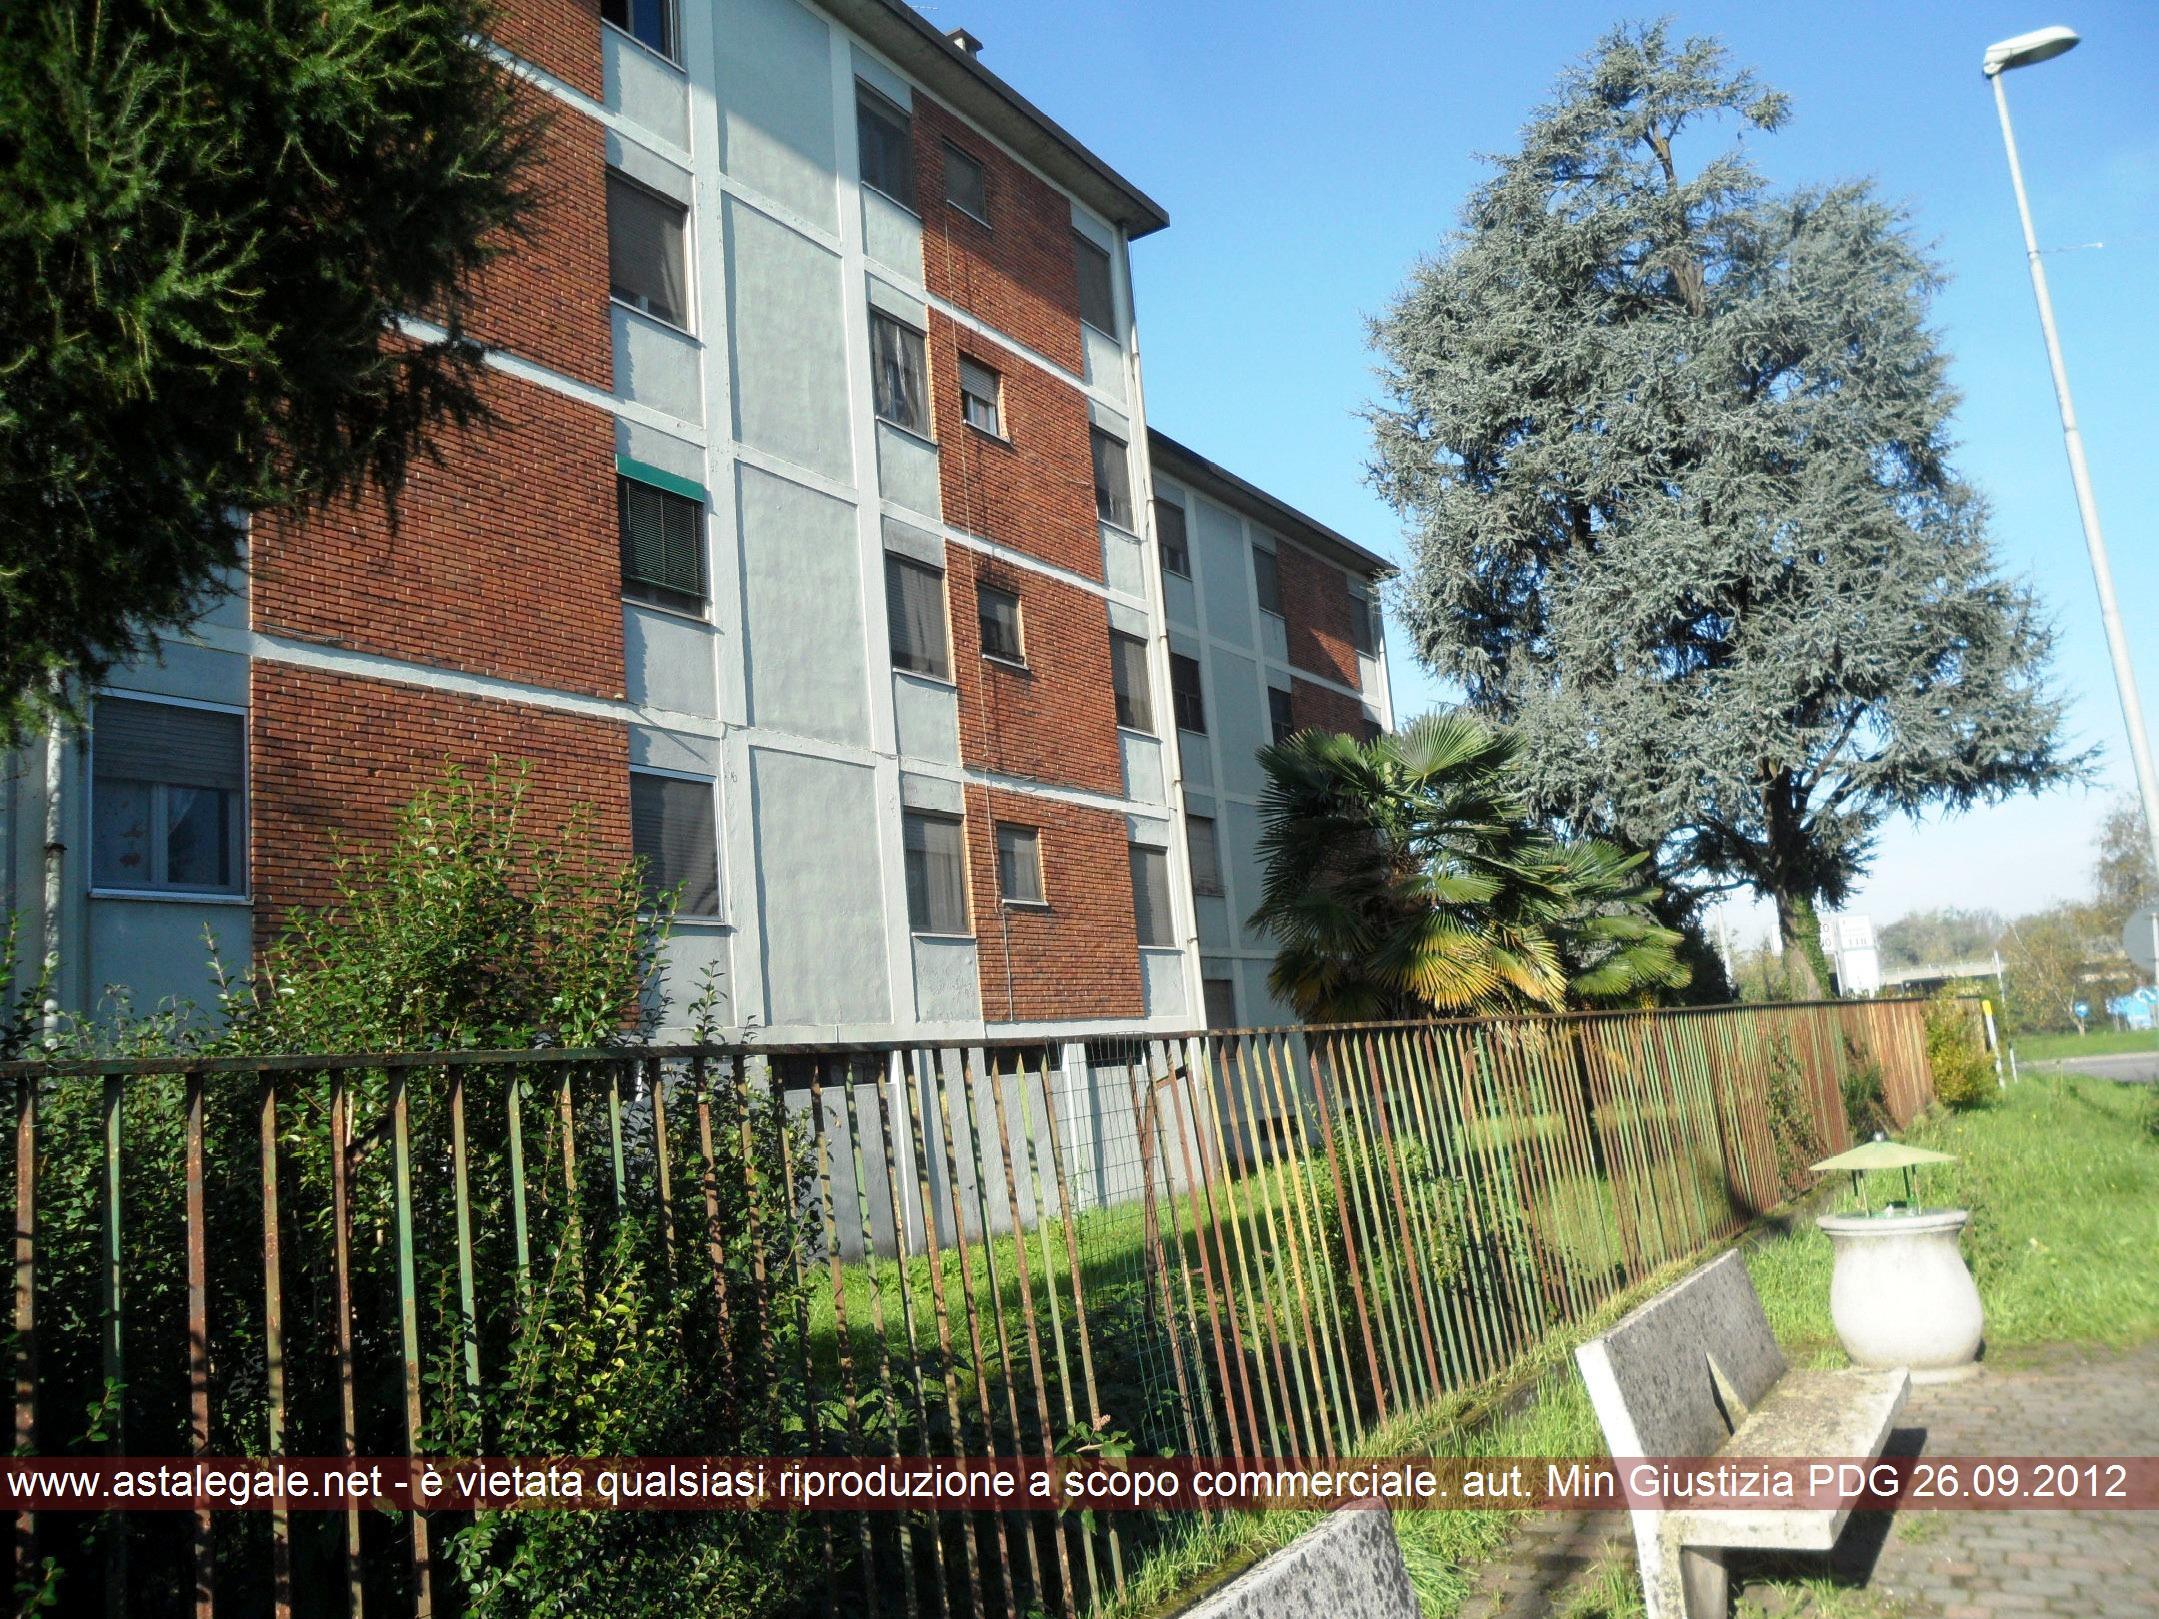 Sant'angelo Lodigiano (LO) Via  Colombo  44